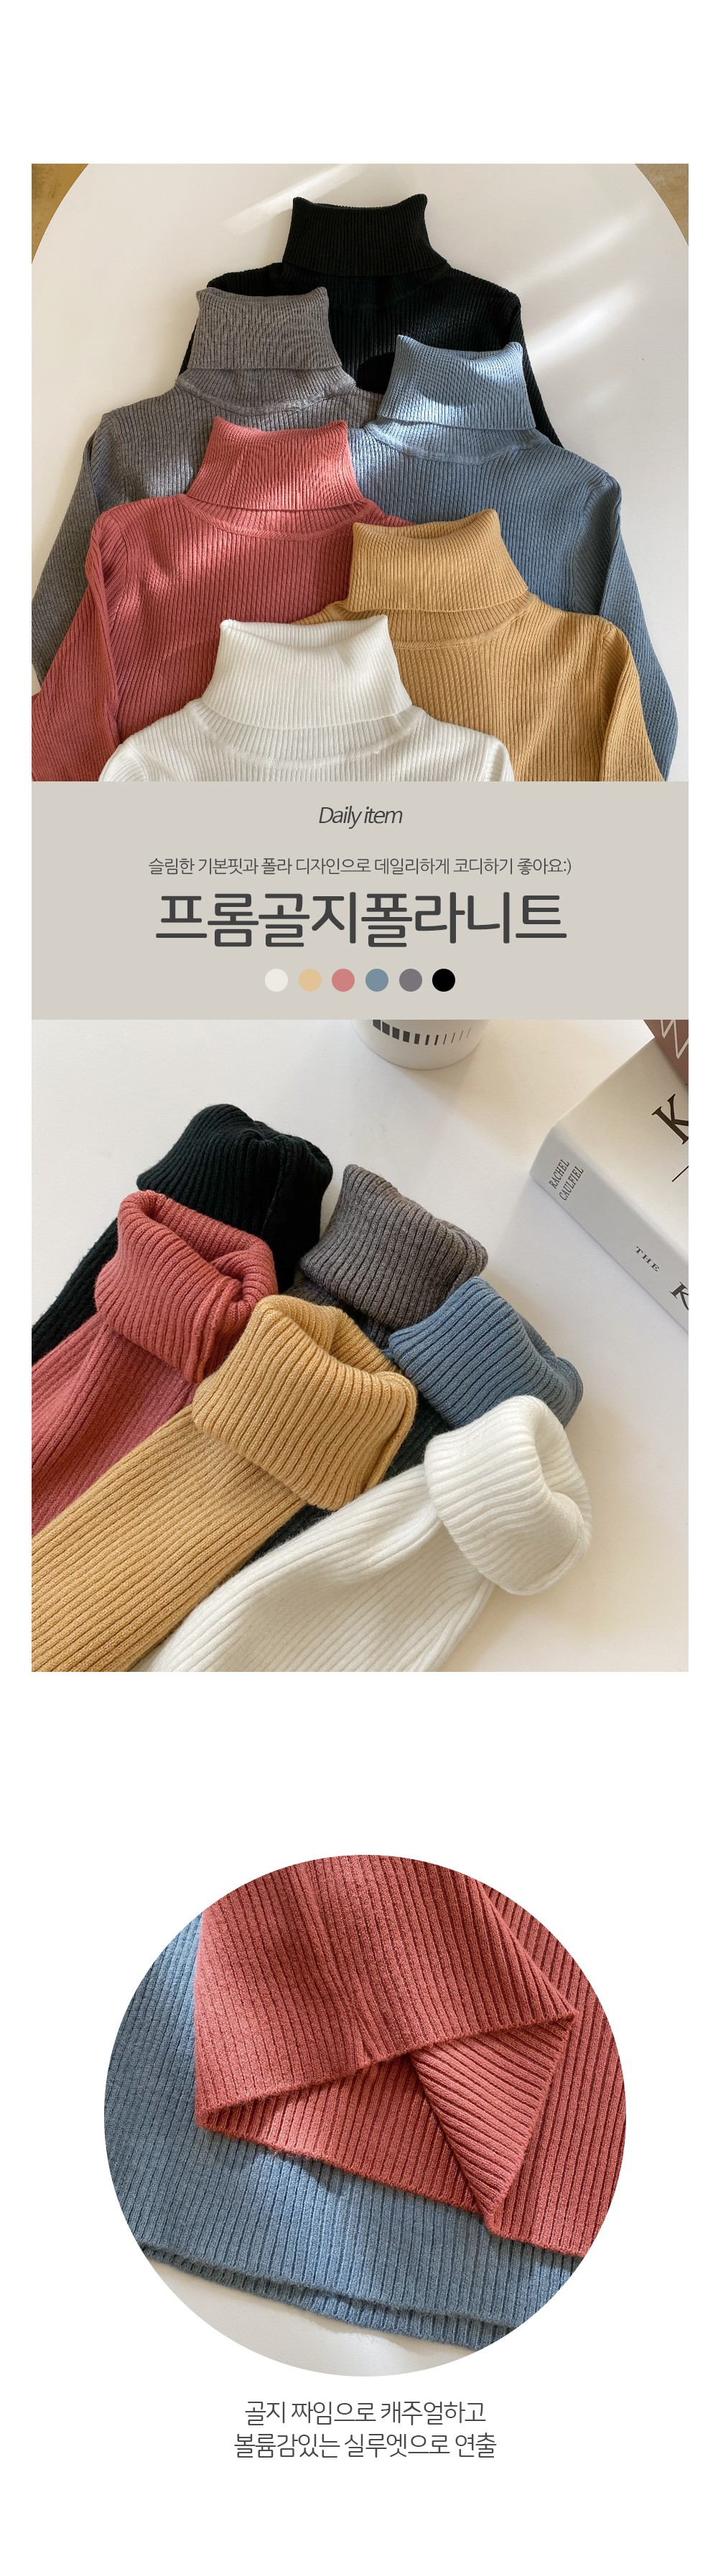 Fromgolji Polar Knit